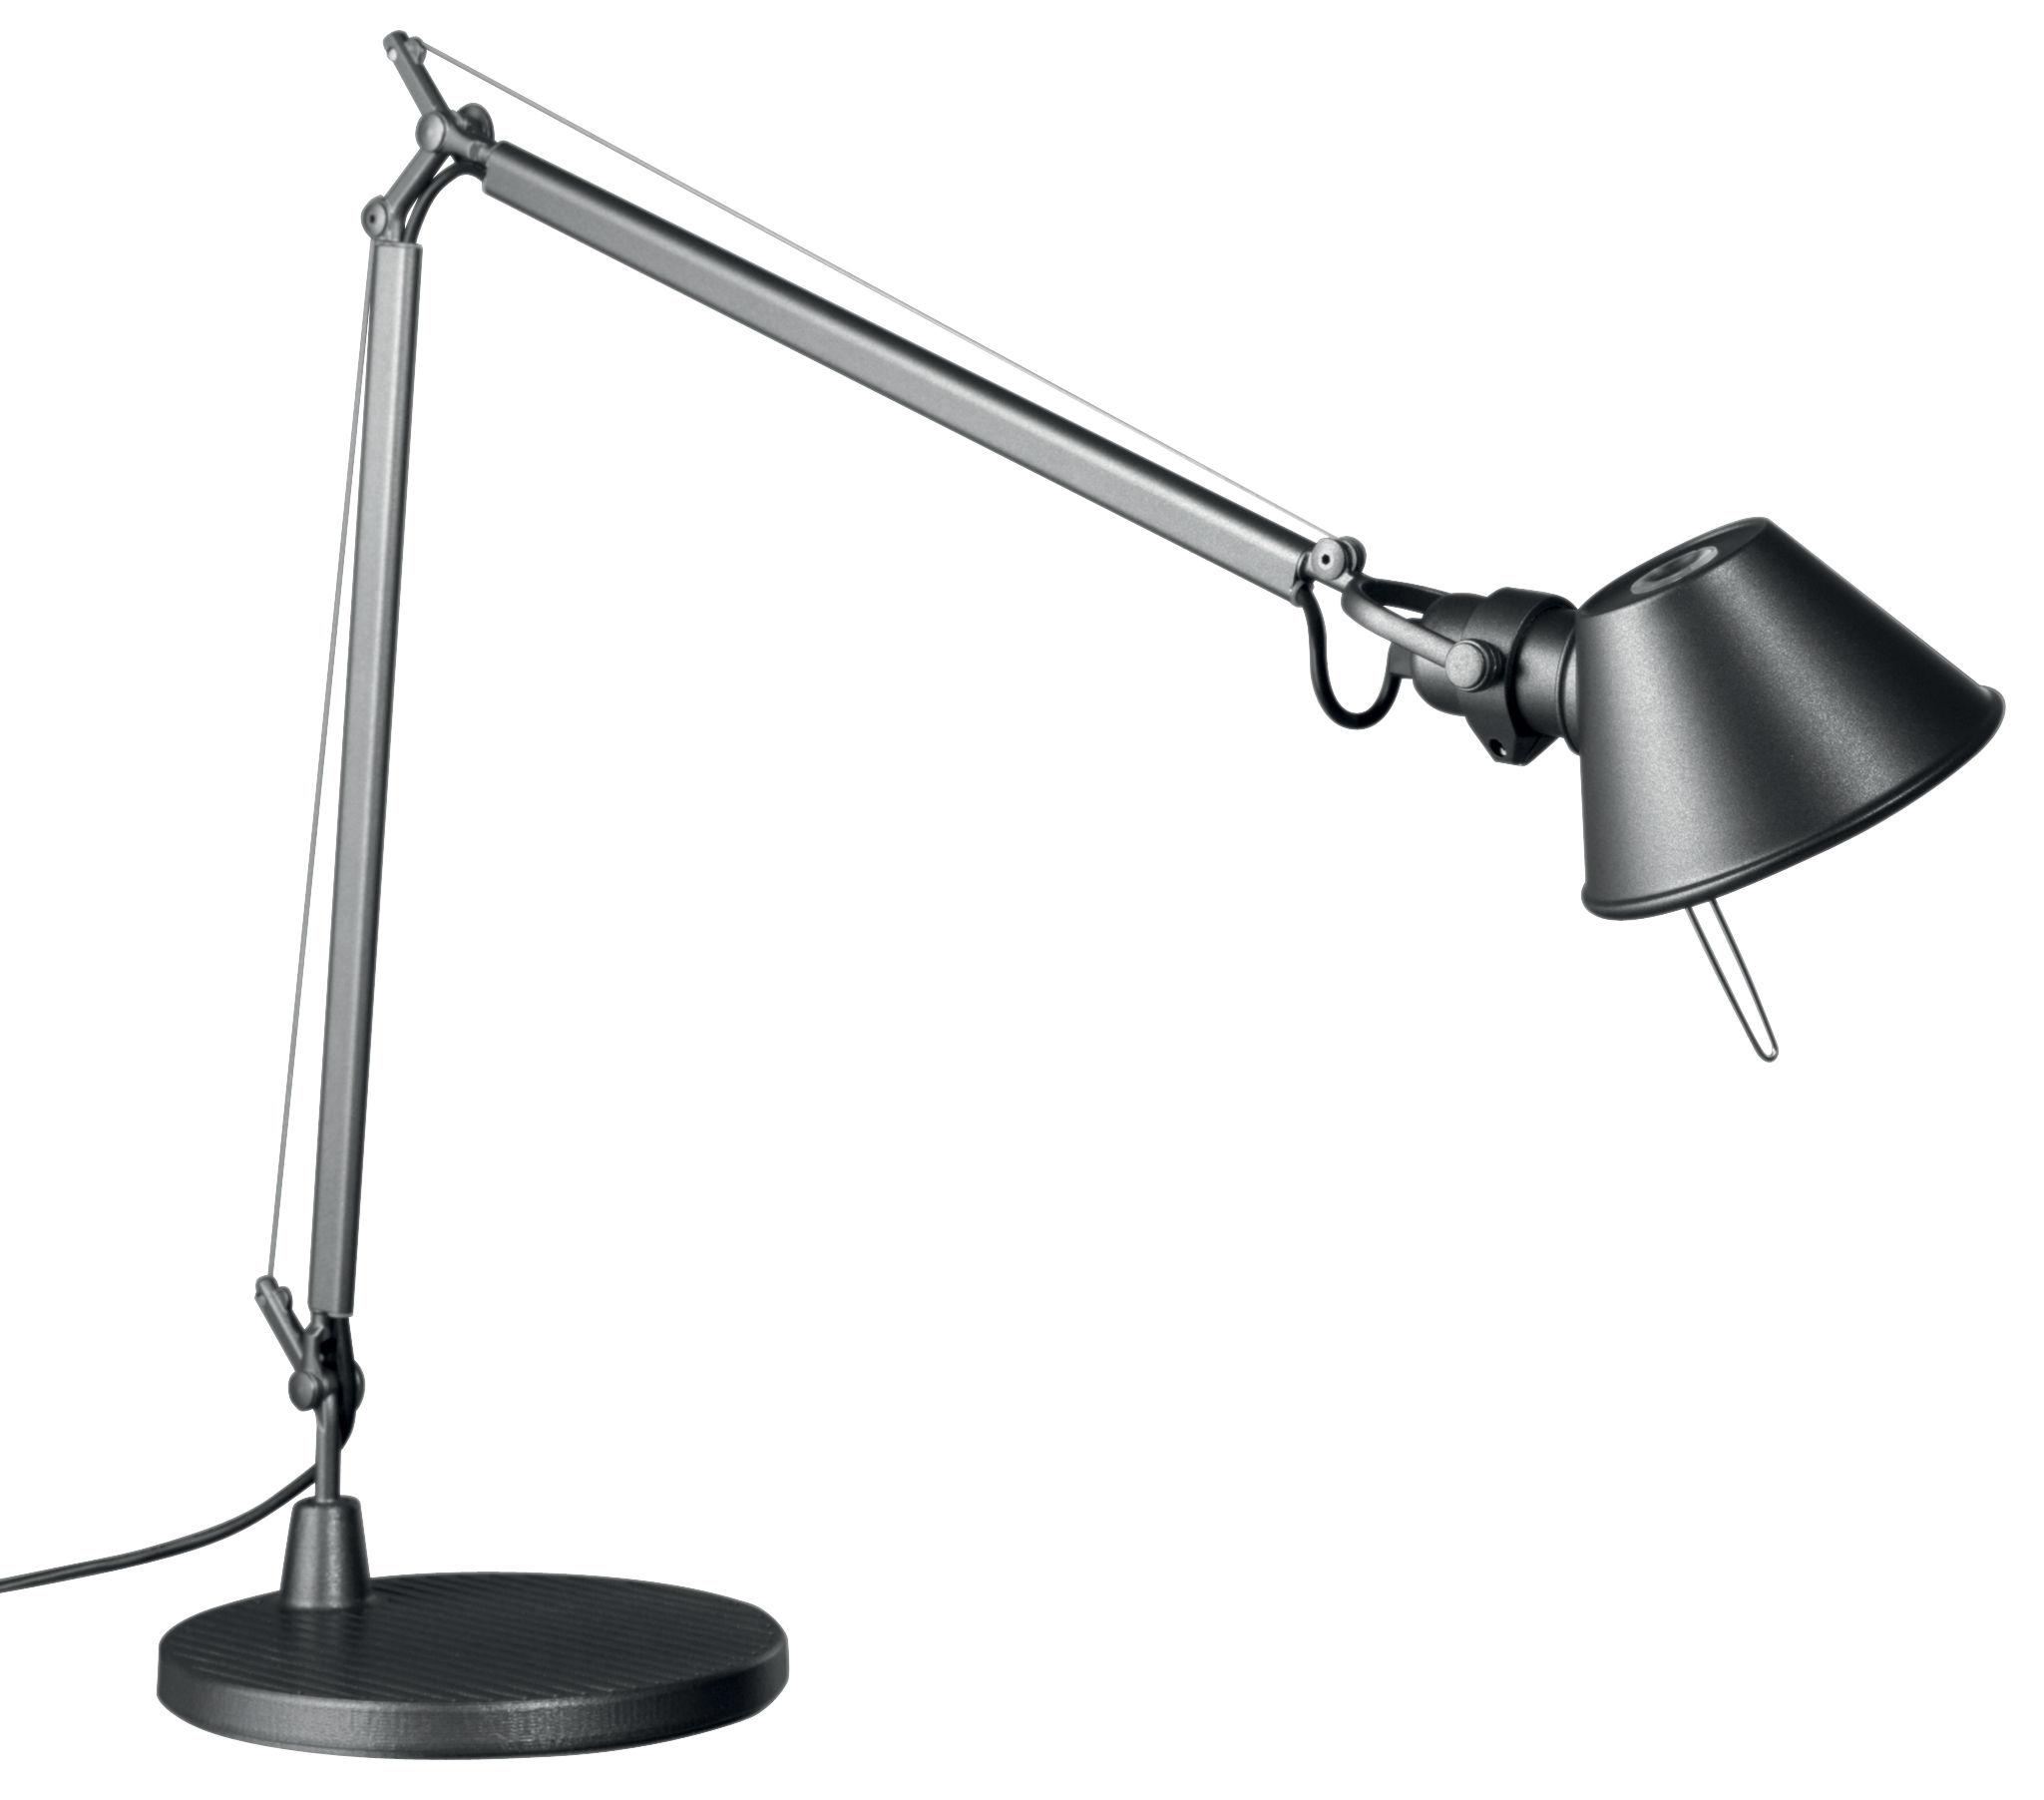 Lighting - Table Lamps - Tolomeo Midi LED Table lamp by Artemide - Anthracit grey - Aluminium, Steel